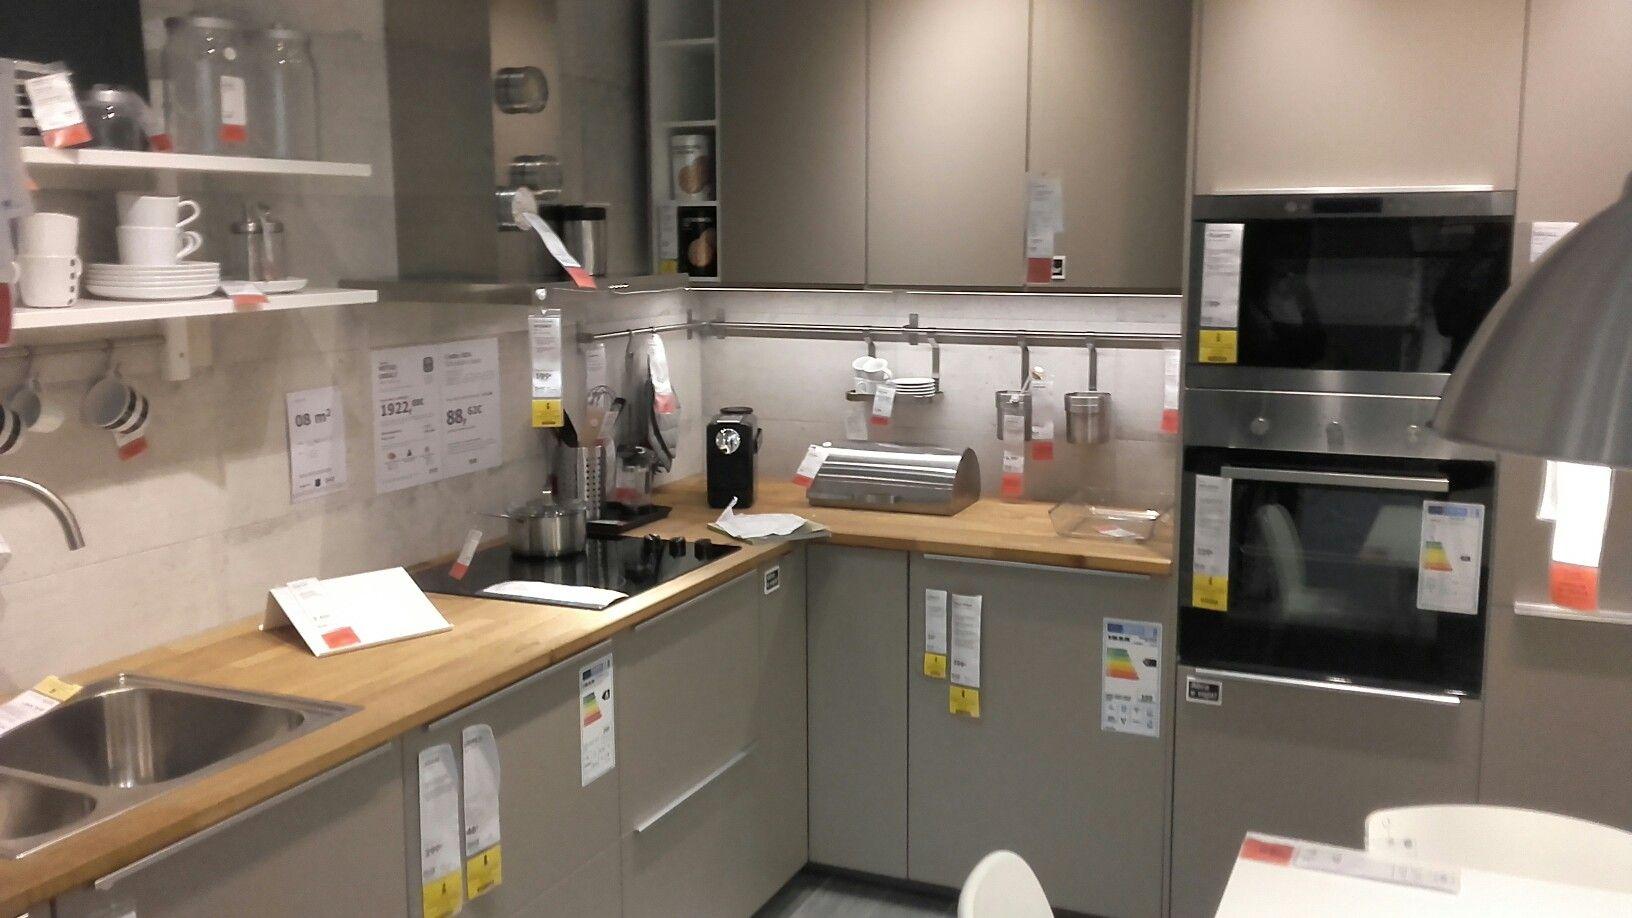 Cozinha Ubbalt Bege Escuro Ikea Portugal Gostei Kd Estive